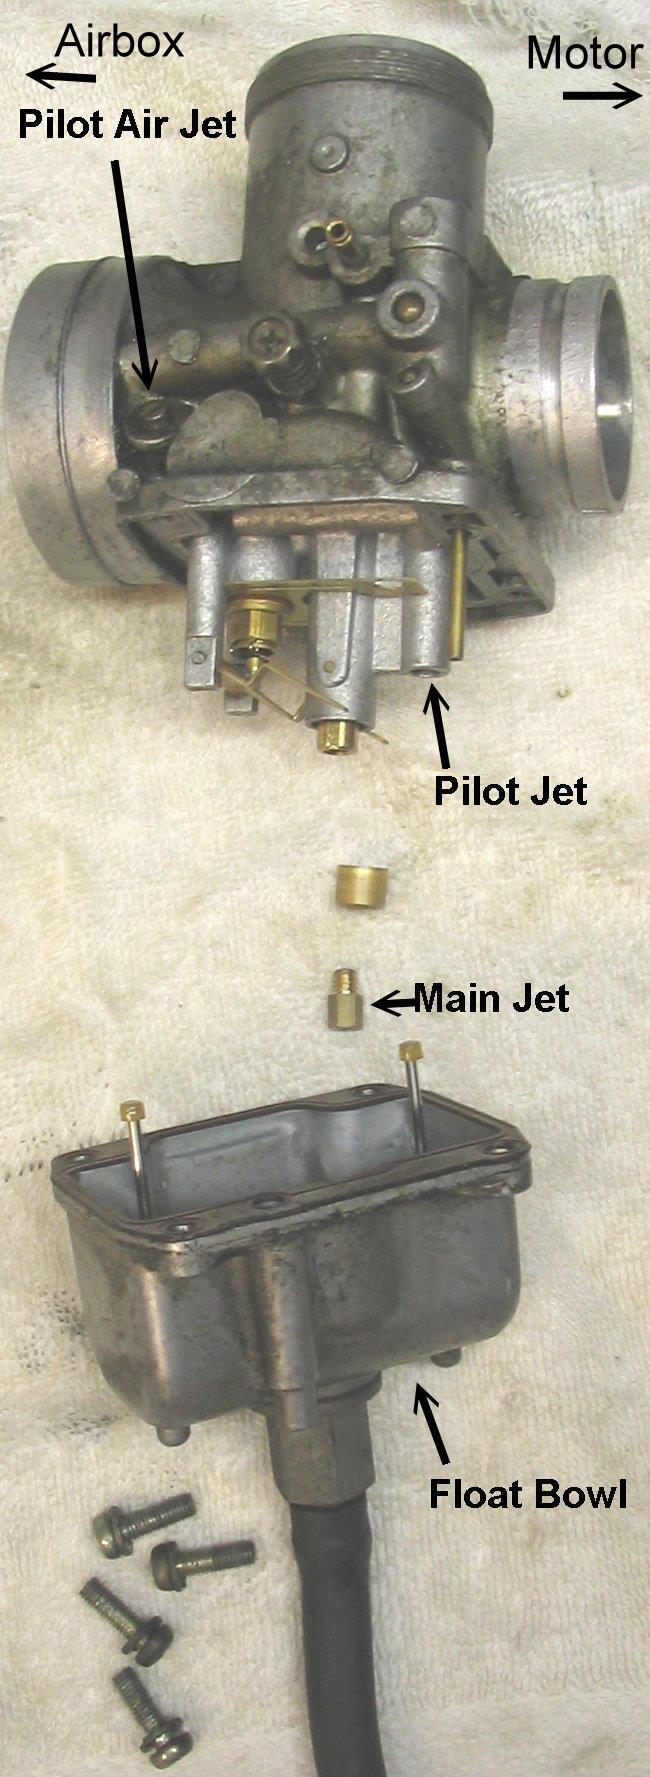 banshee engine diagram